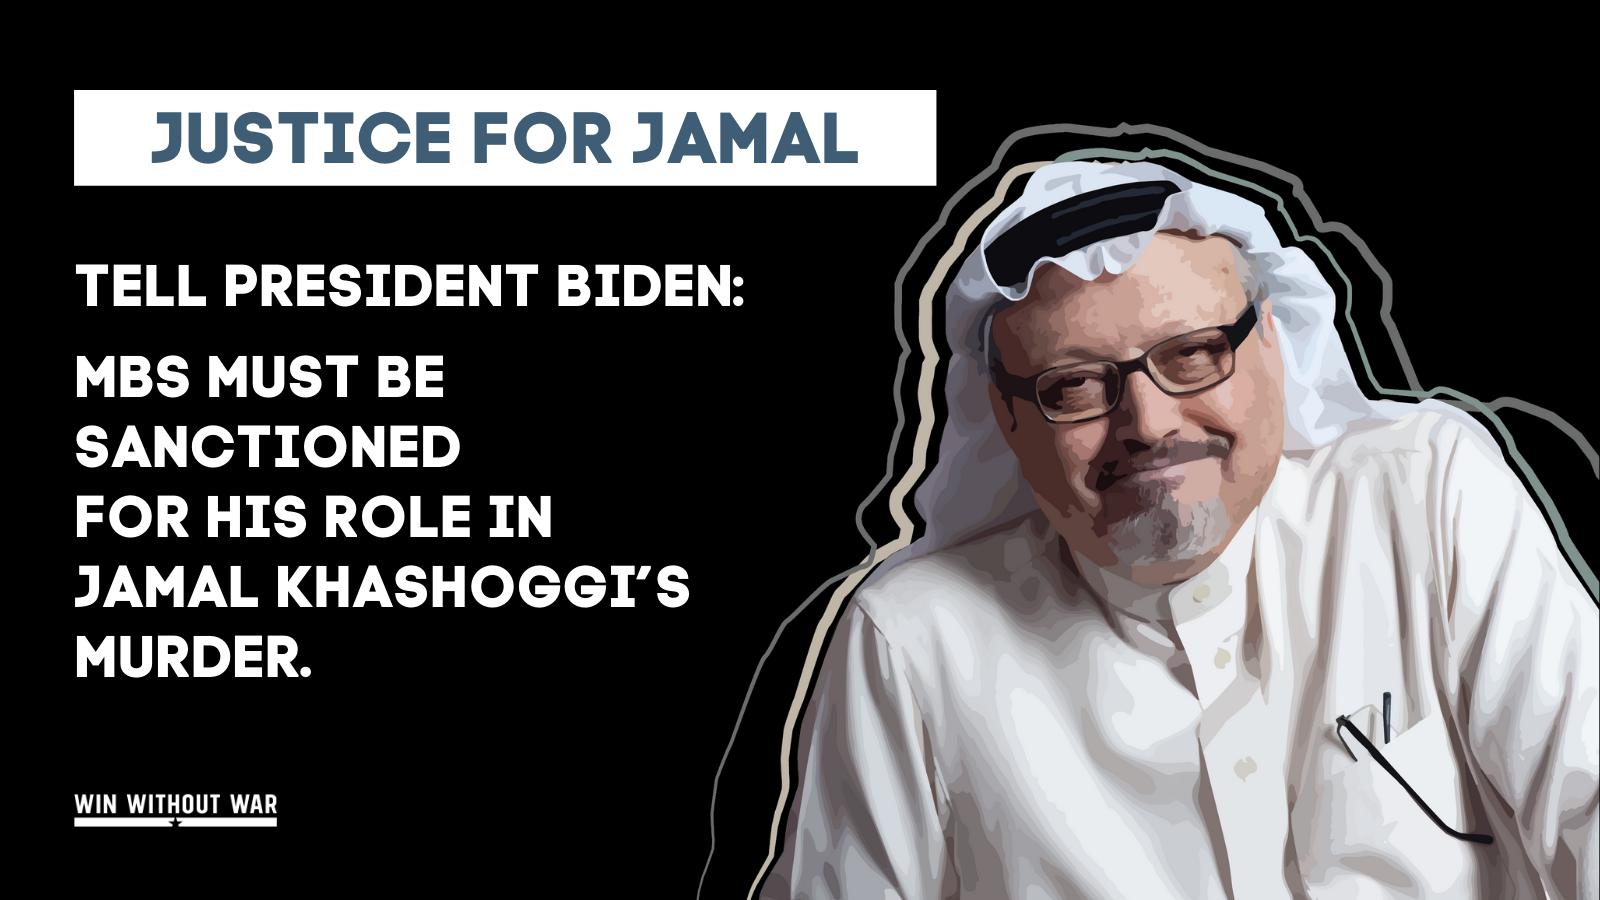 #JusticeforJamal: Sanction Crown Prince Mohammed bin Salman